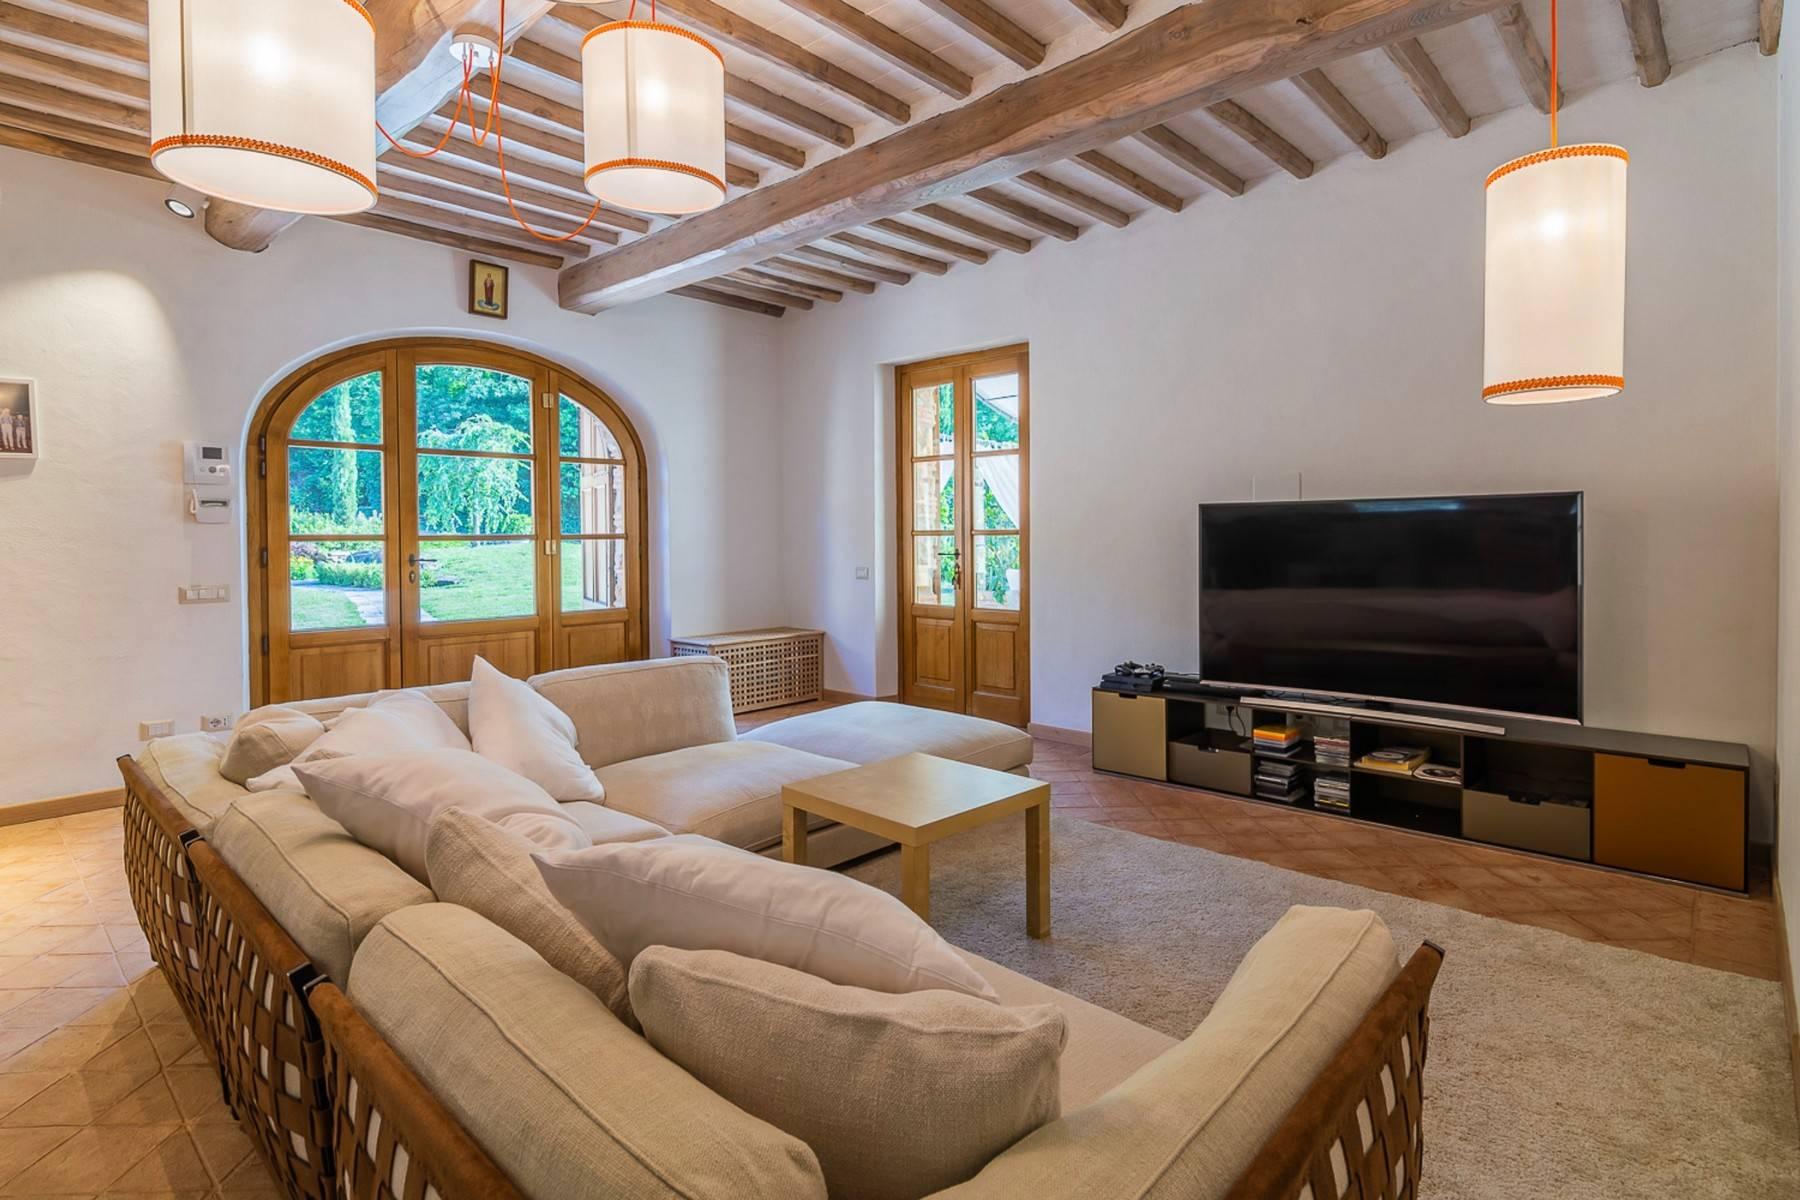 Villa in Vendita a Lucca: 5 locali, 1130 mq - Foto 25